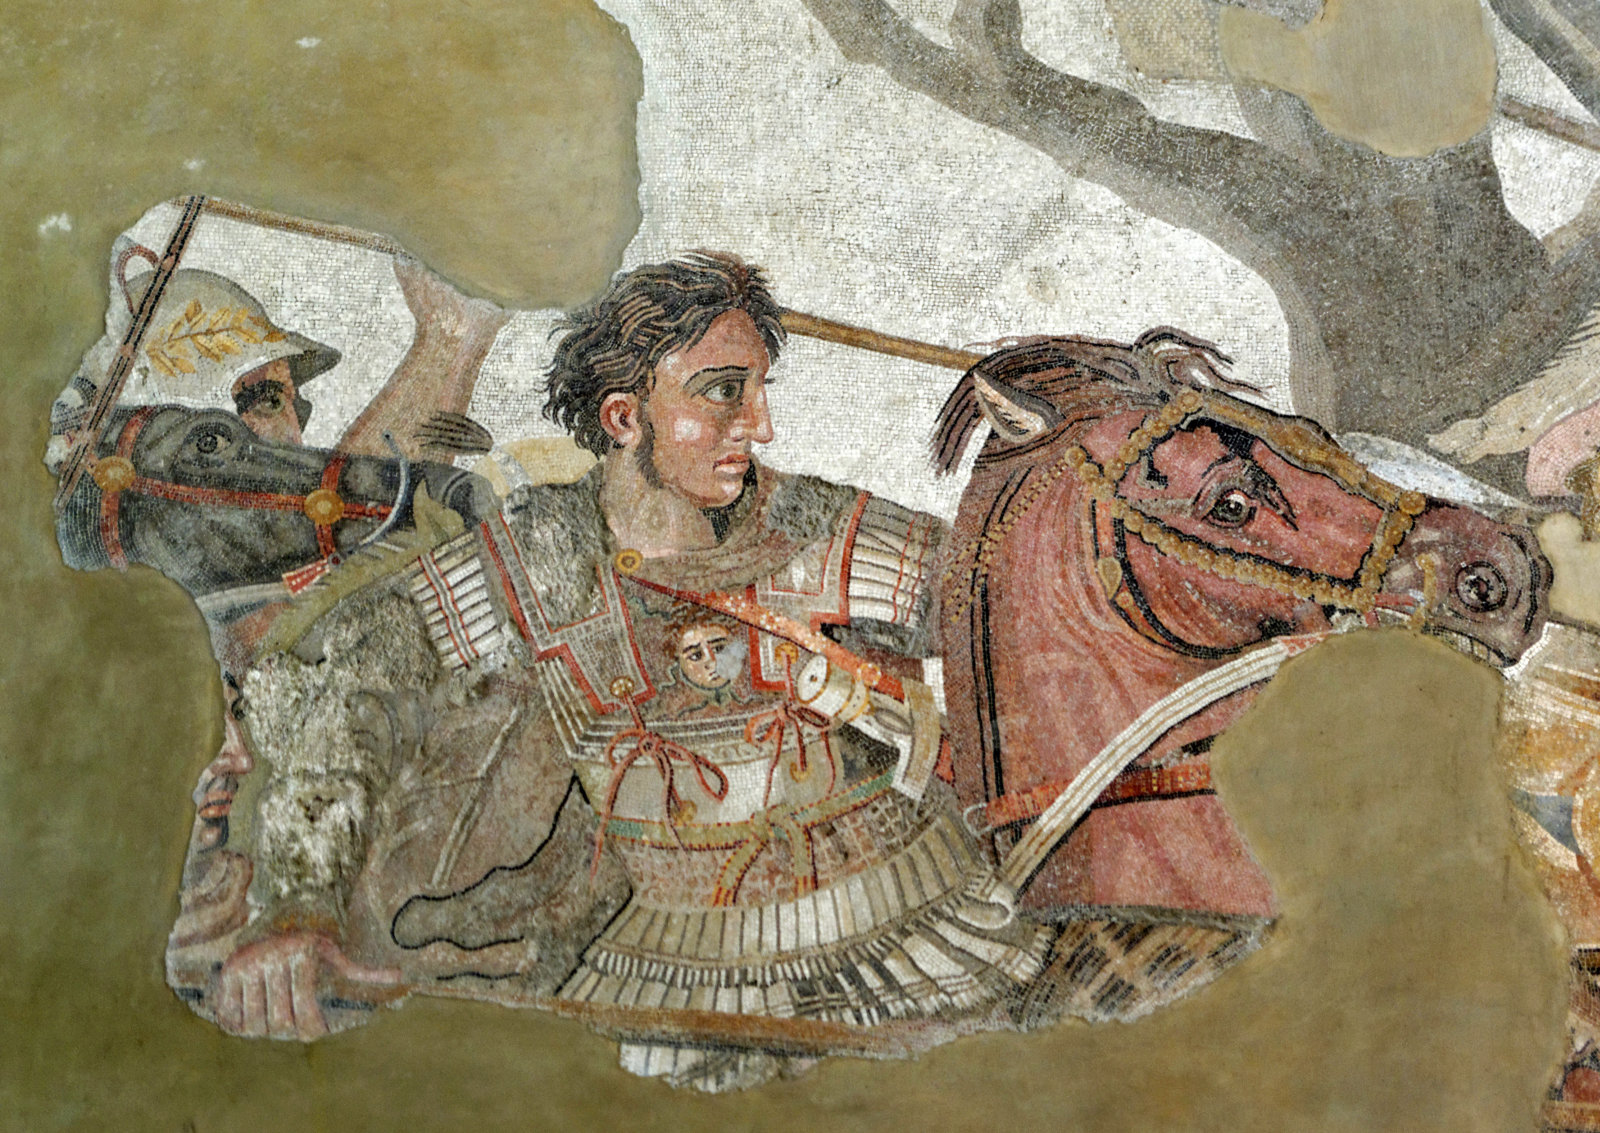 "Kopie des 2. Jhs. v. Chr. nach einem Gemälde des späten 4./frühen 3. Jhs. v. Chr., Mosaik/Stein, Maße 5,13 m x 2,72 m, Neapel, Museo Archeologico Nazionale.<br> Quelle: <a href=""https://commons.wikimedia.org/wiki/File:Alexander_and_Bucephalus_-_Battle_of_Issus_mosaic_-_Museo_Archeologico_Nazionale_-_Naples_BW.jpg"">User:Berthold Werner / Wikimedia Commons</a> <br>Lizenz: <a href=""https://creativecommons.org/licenses/by-sa/3.0/"">Creative Commons BY-SA 3.0 Unported</a>"